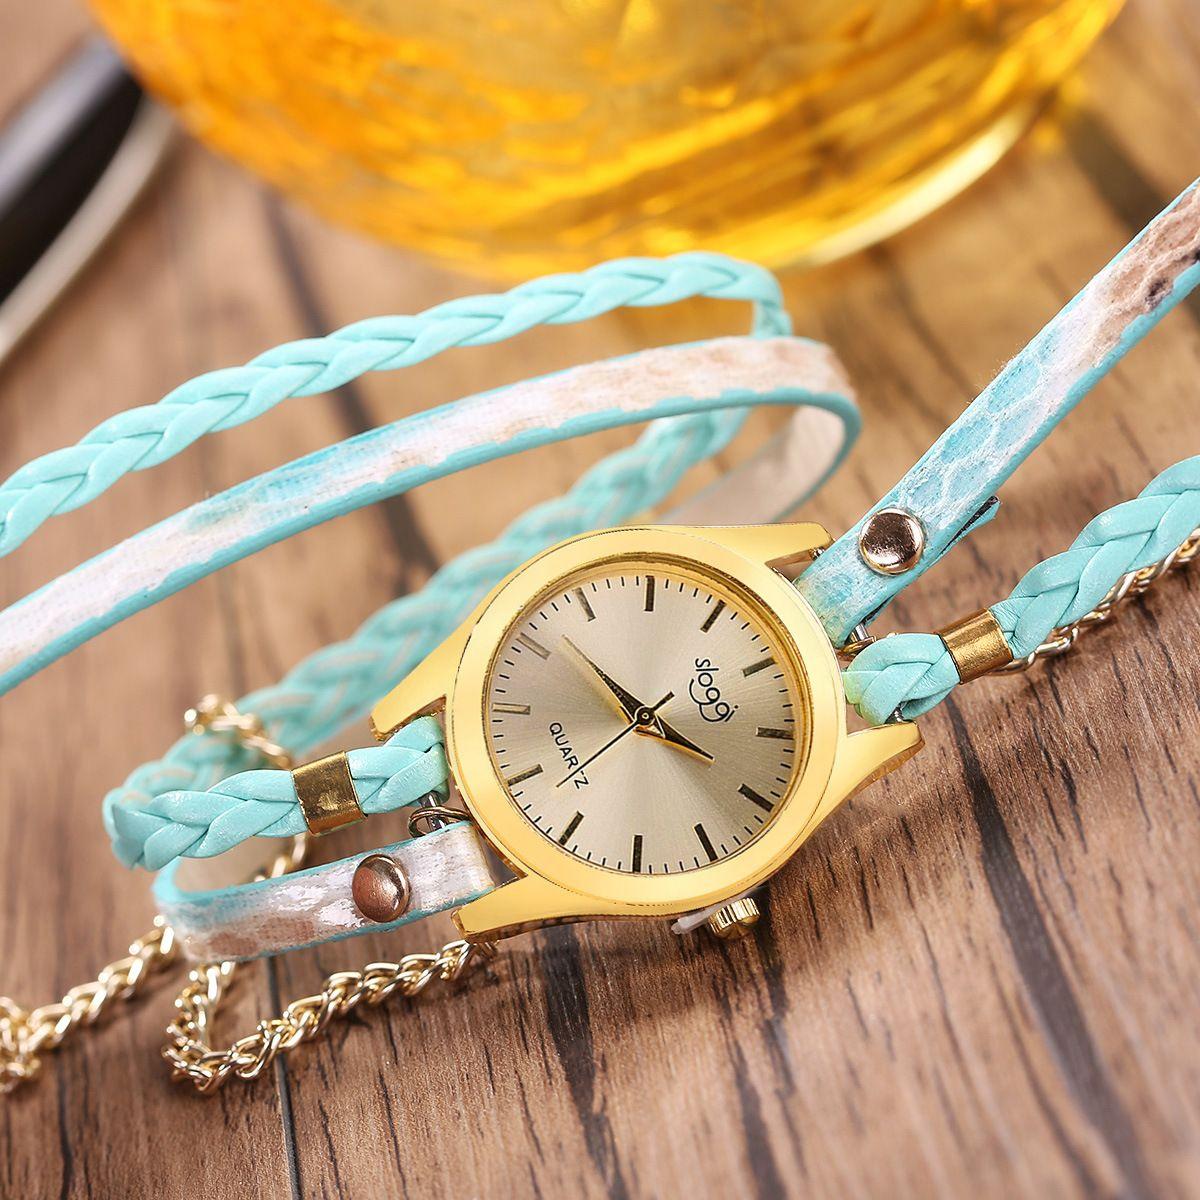 New Simple snake Design Handmade Weave watch fashion Women Leather Bracelet Quartz Watch Multicolor Long Straps Dress Wrist Watches